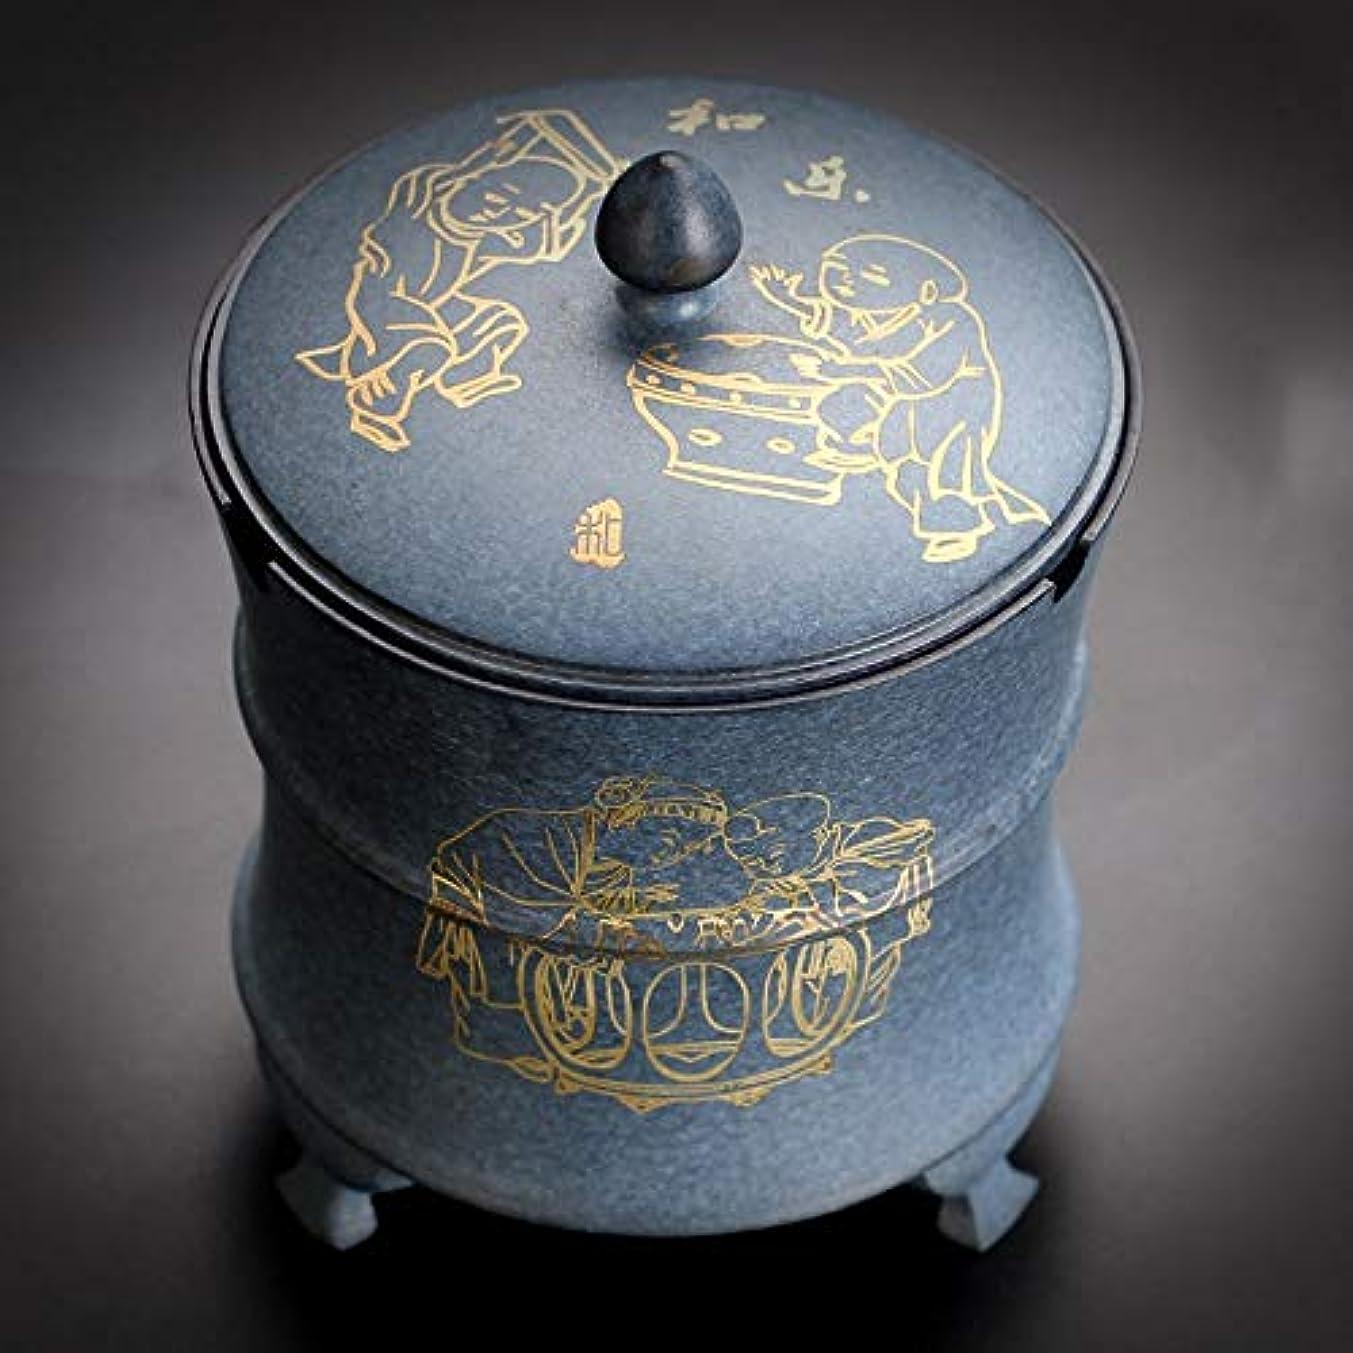 保守可能箱課す純銅灰皿銅工芸品居間研究室装飾アンティーク灰皿装飾品